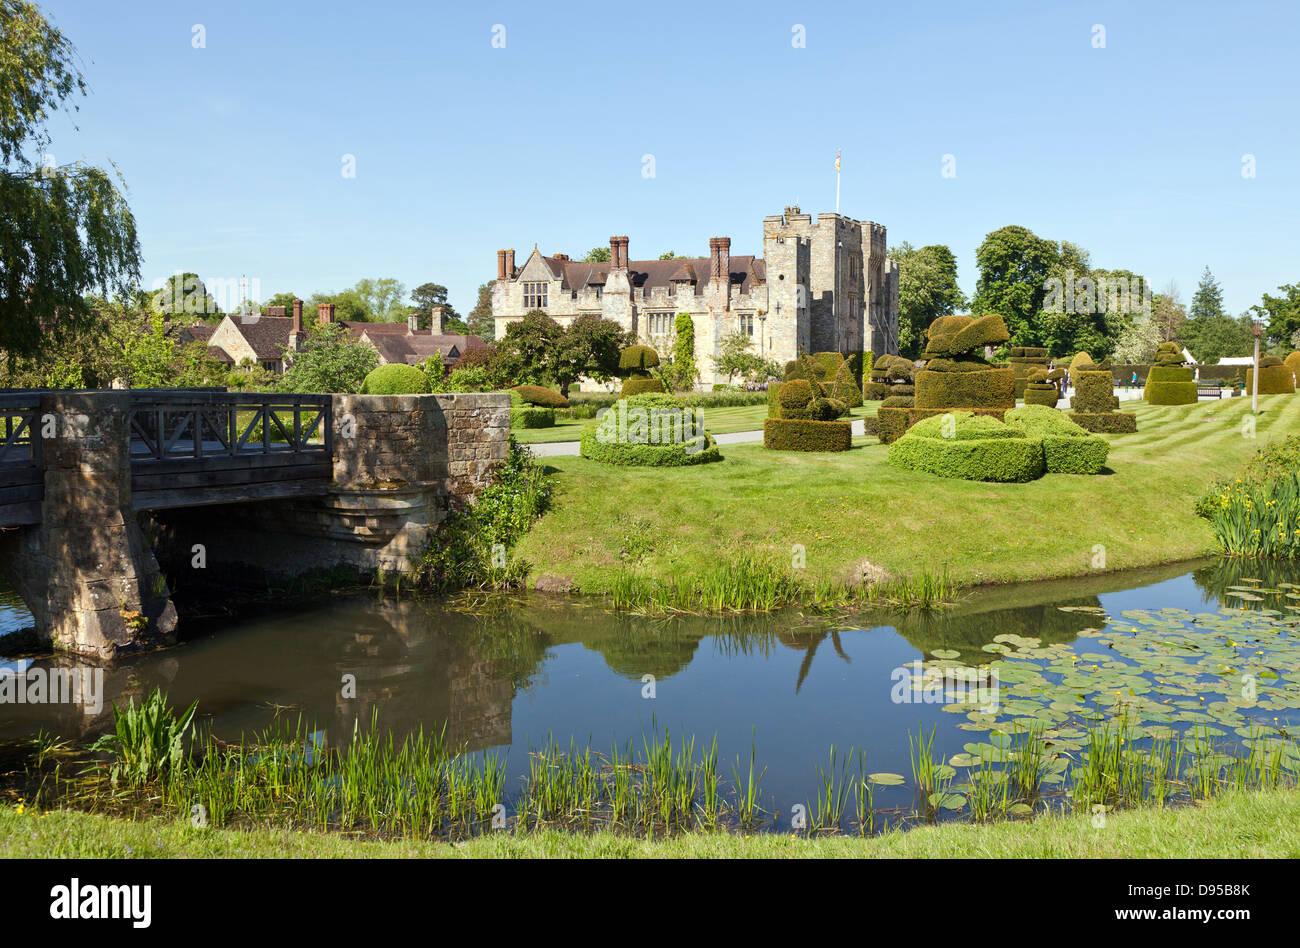 Hever Castle Kent UK - Stock Image